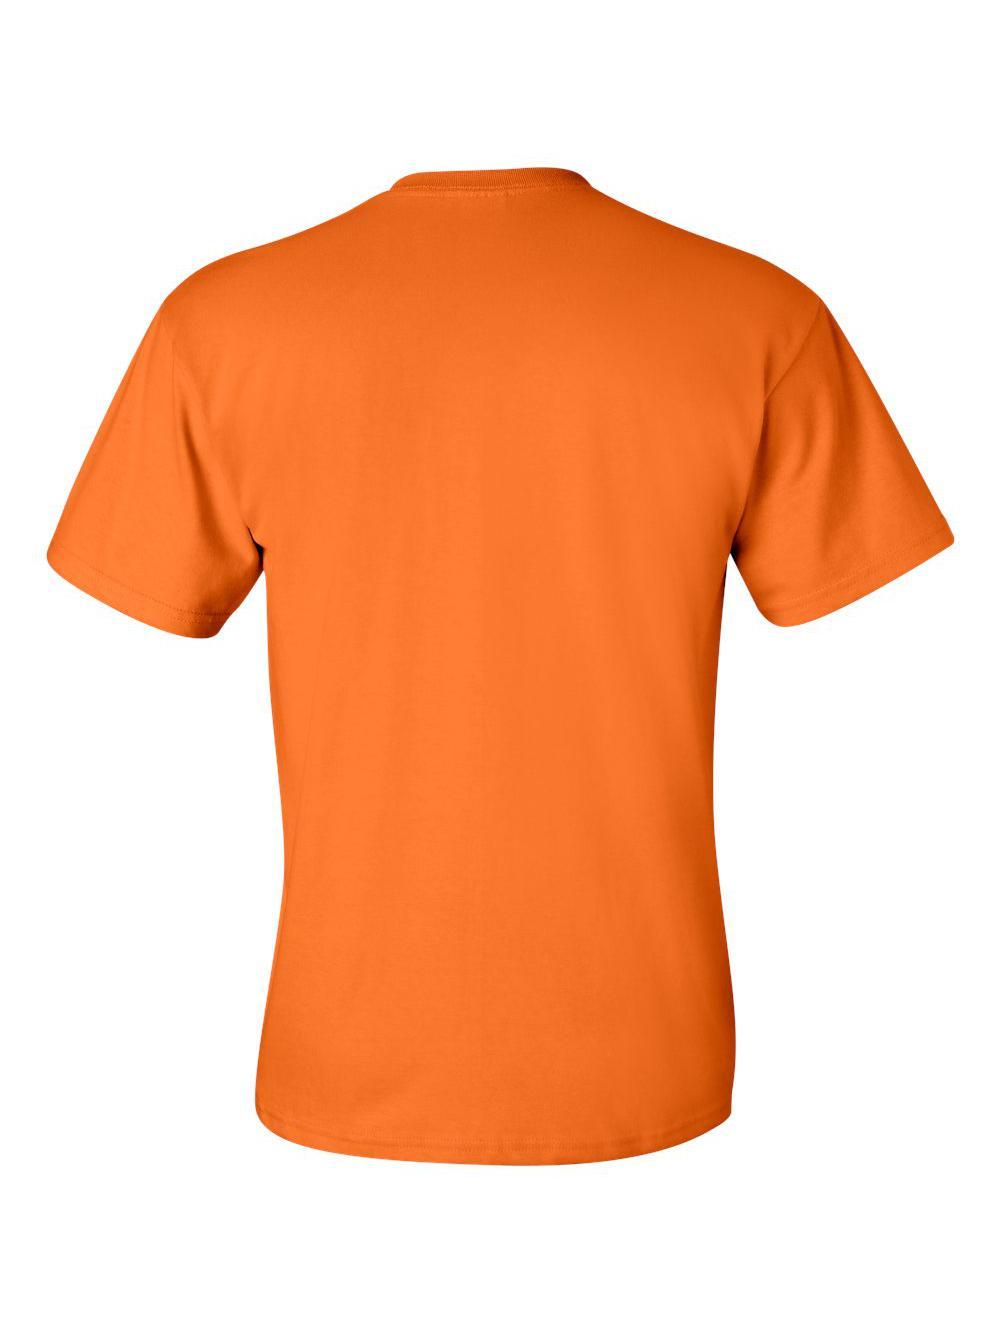 Gildan-Ultra-Cotton-T-Shirt-with-a-Pocket-2300 thumbnail 37